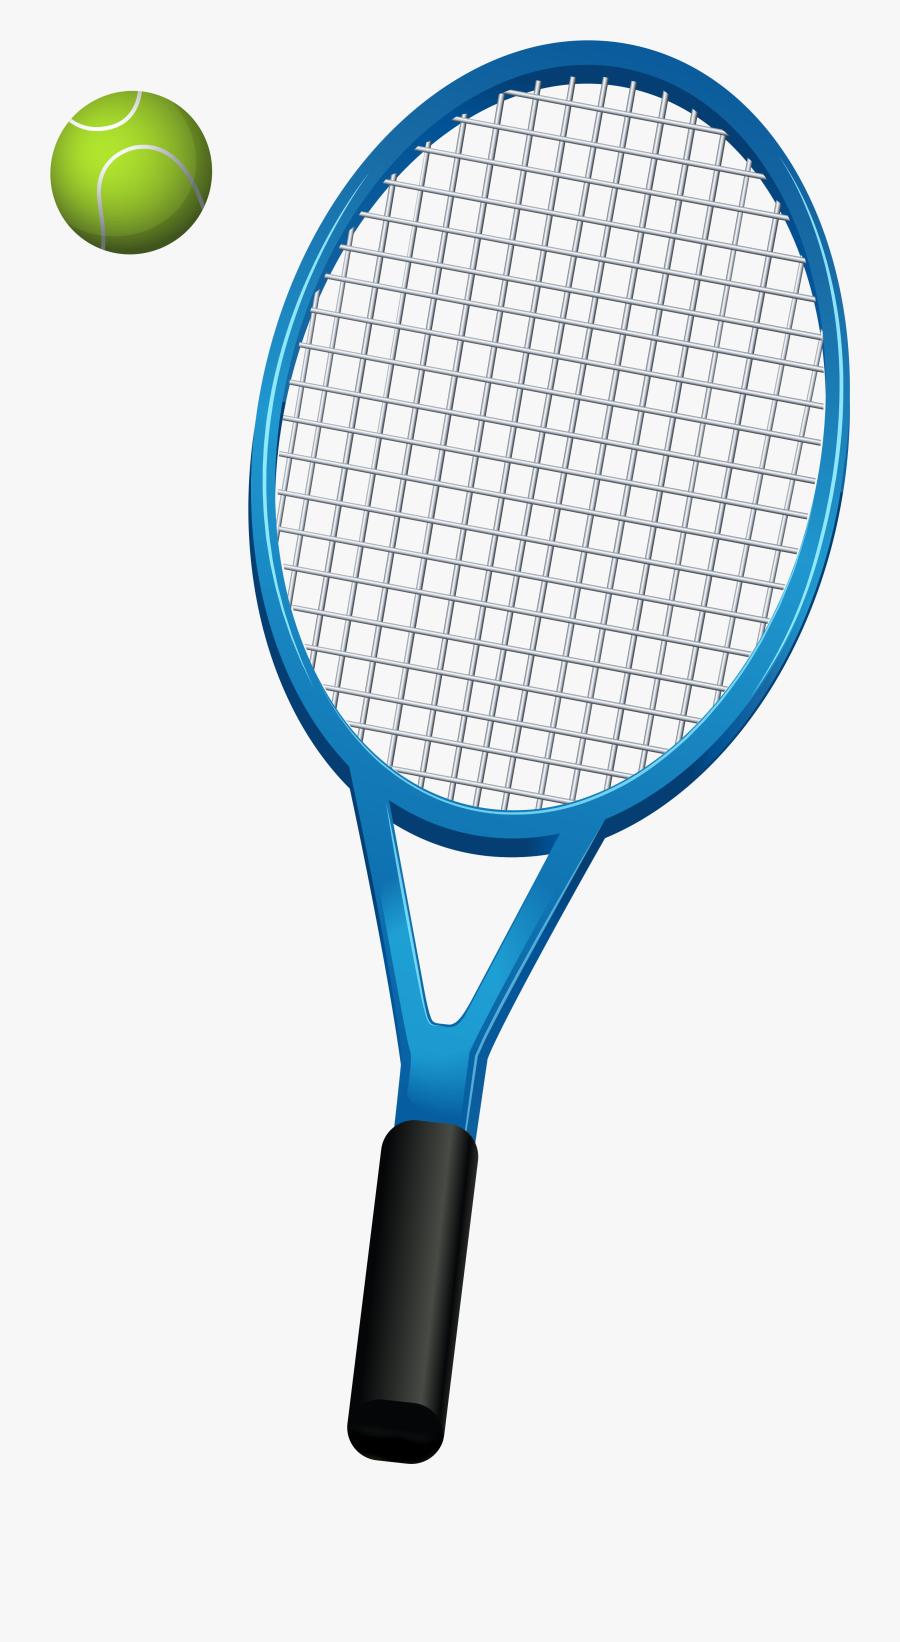 Tennis Racket Clipart Png, Transparent Clipart